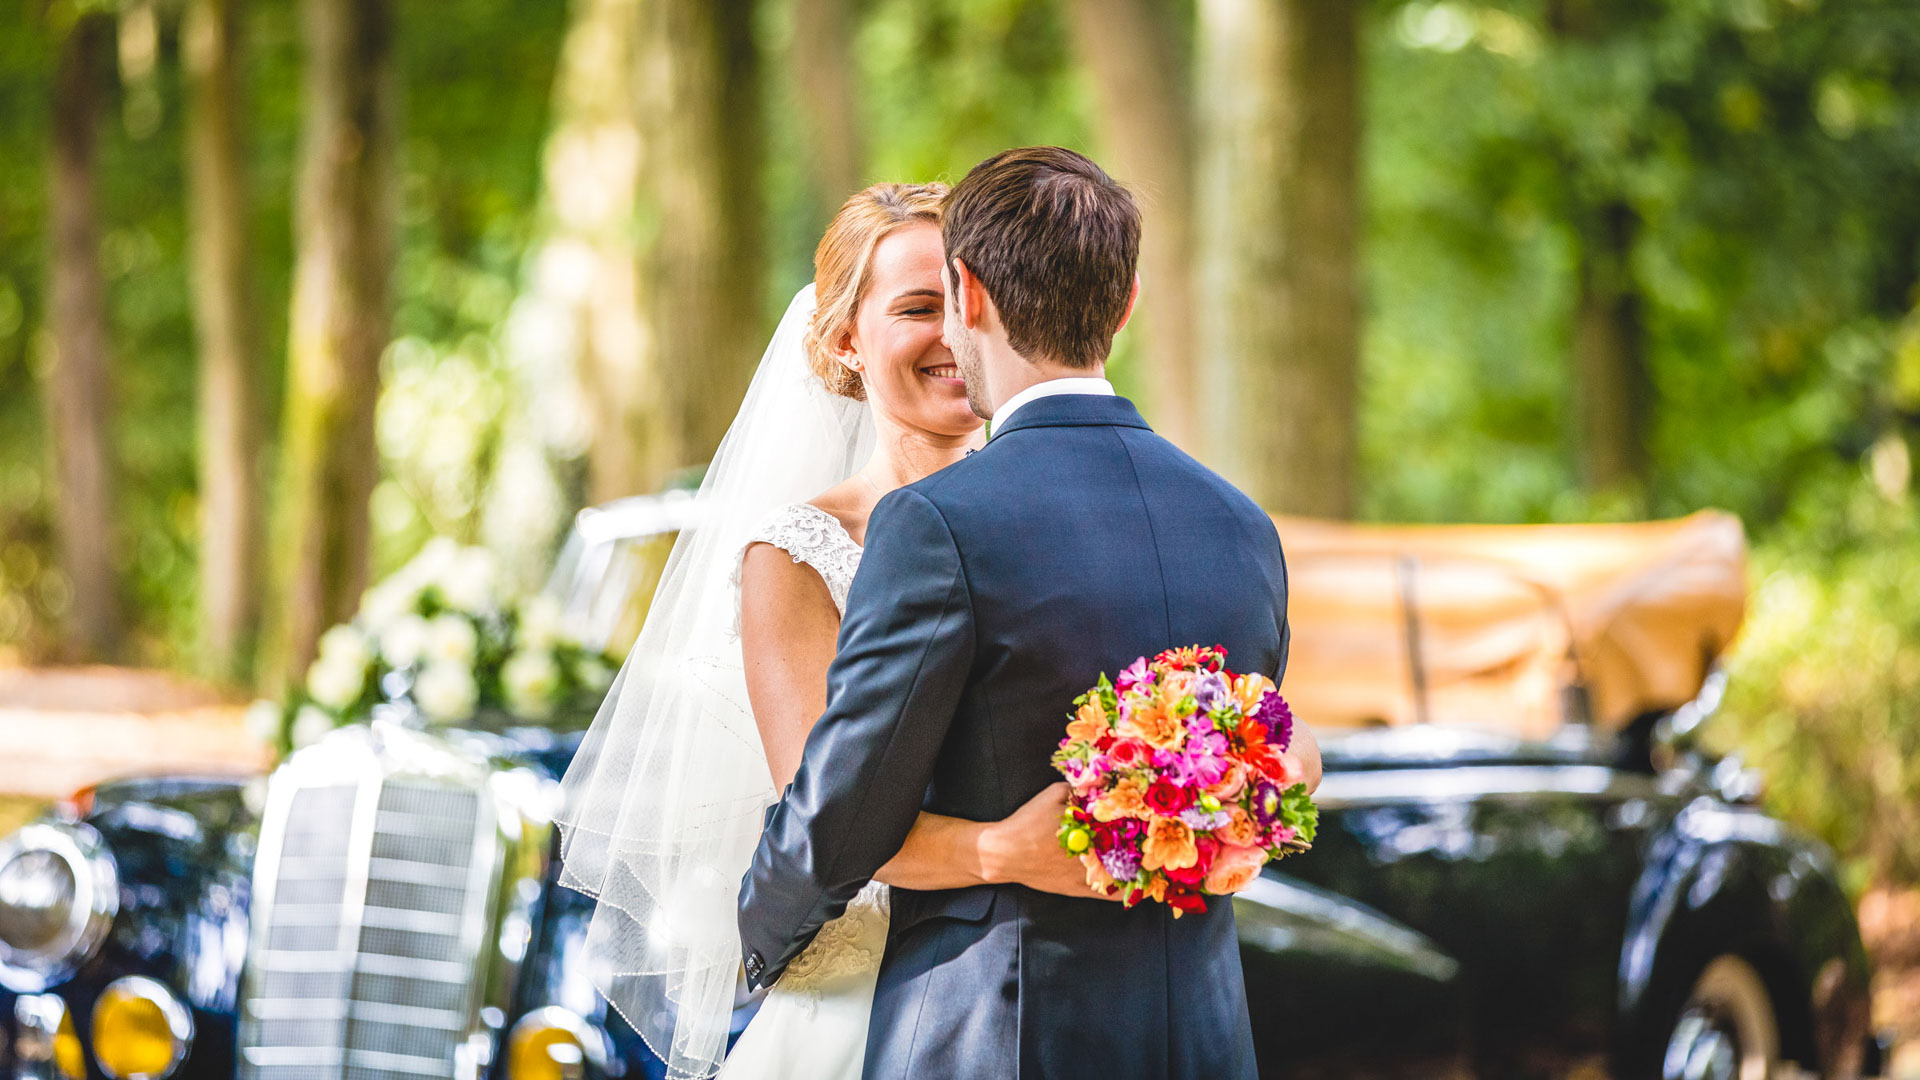 Hochzeitsfotograf Thomas Henneböhle 2018